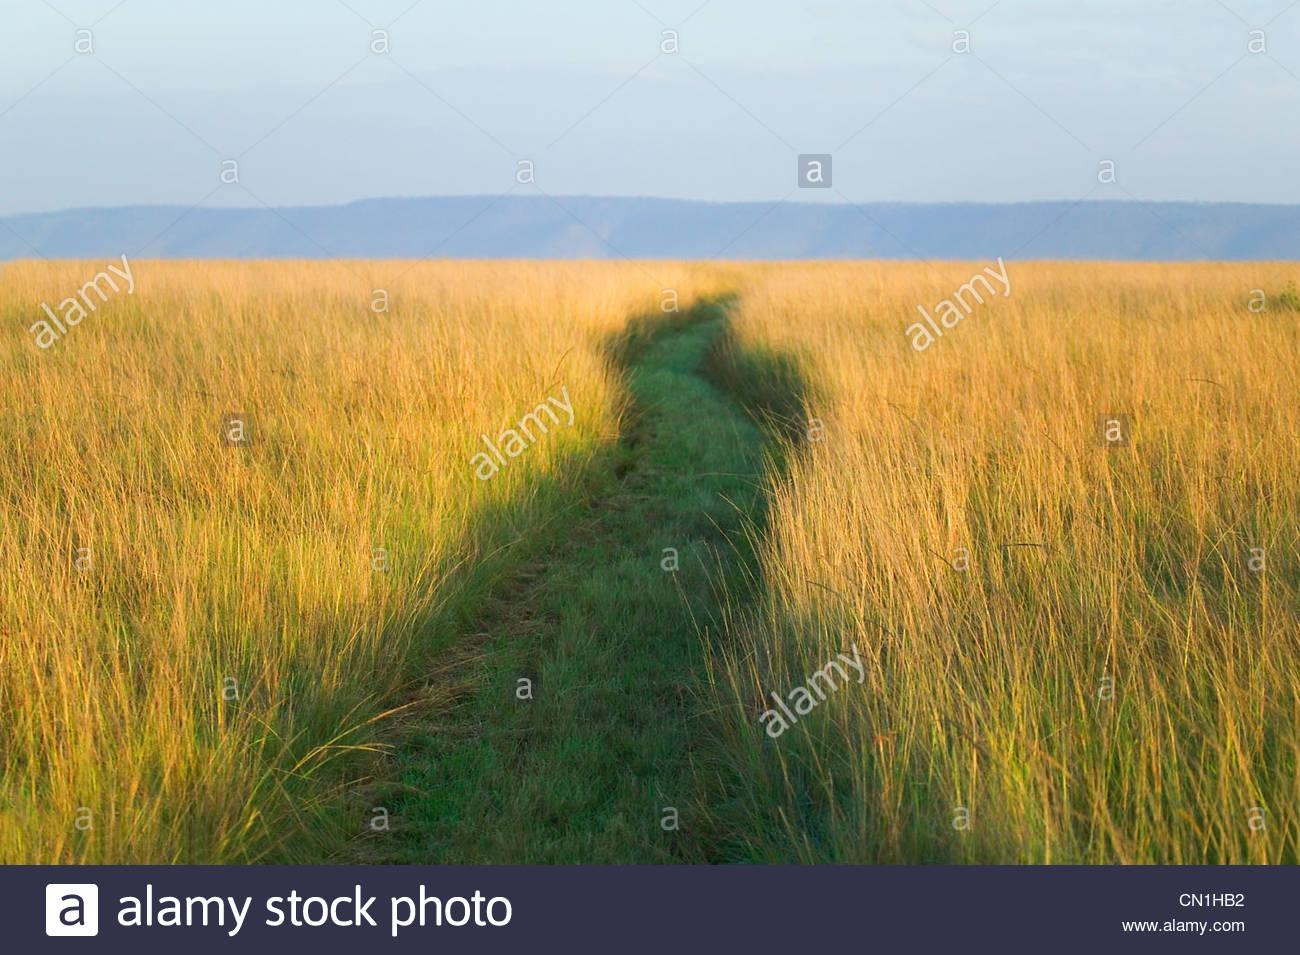 Path among tall grass on the savanah, Masai Mara National Reserve, Kenya Stock Photo